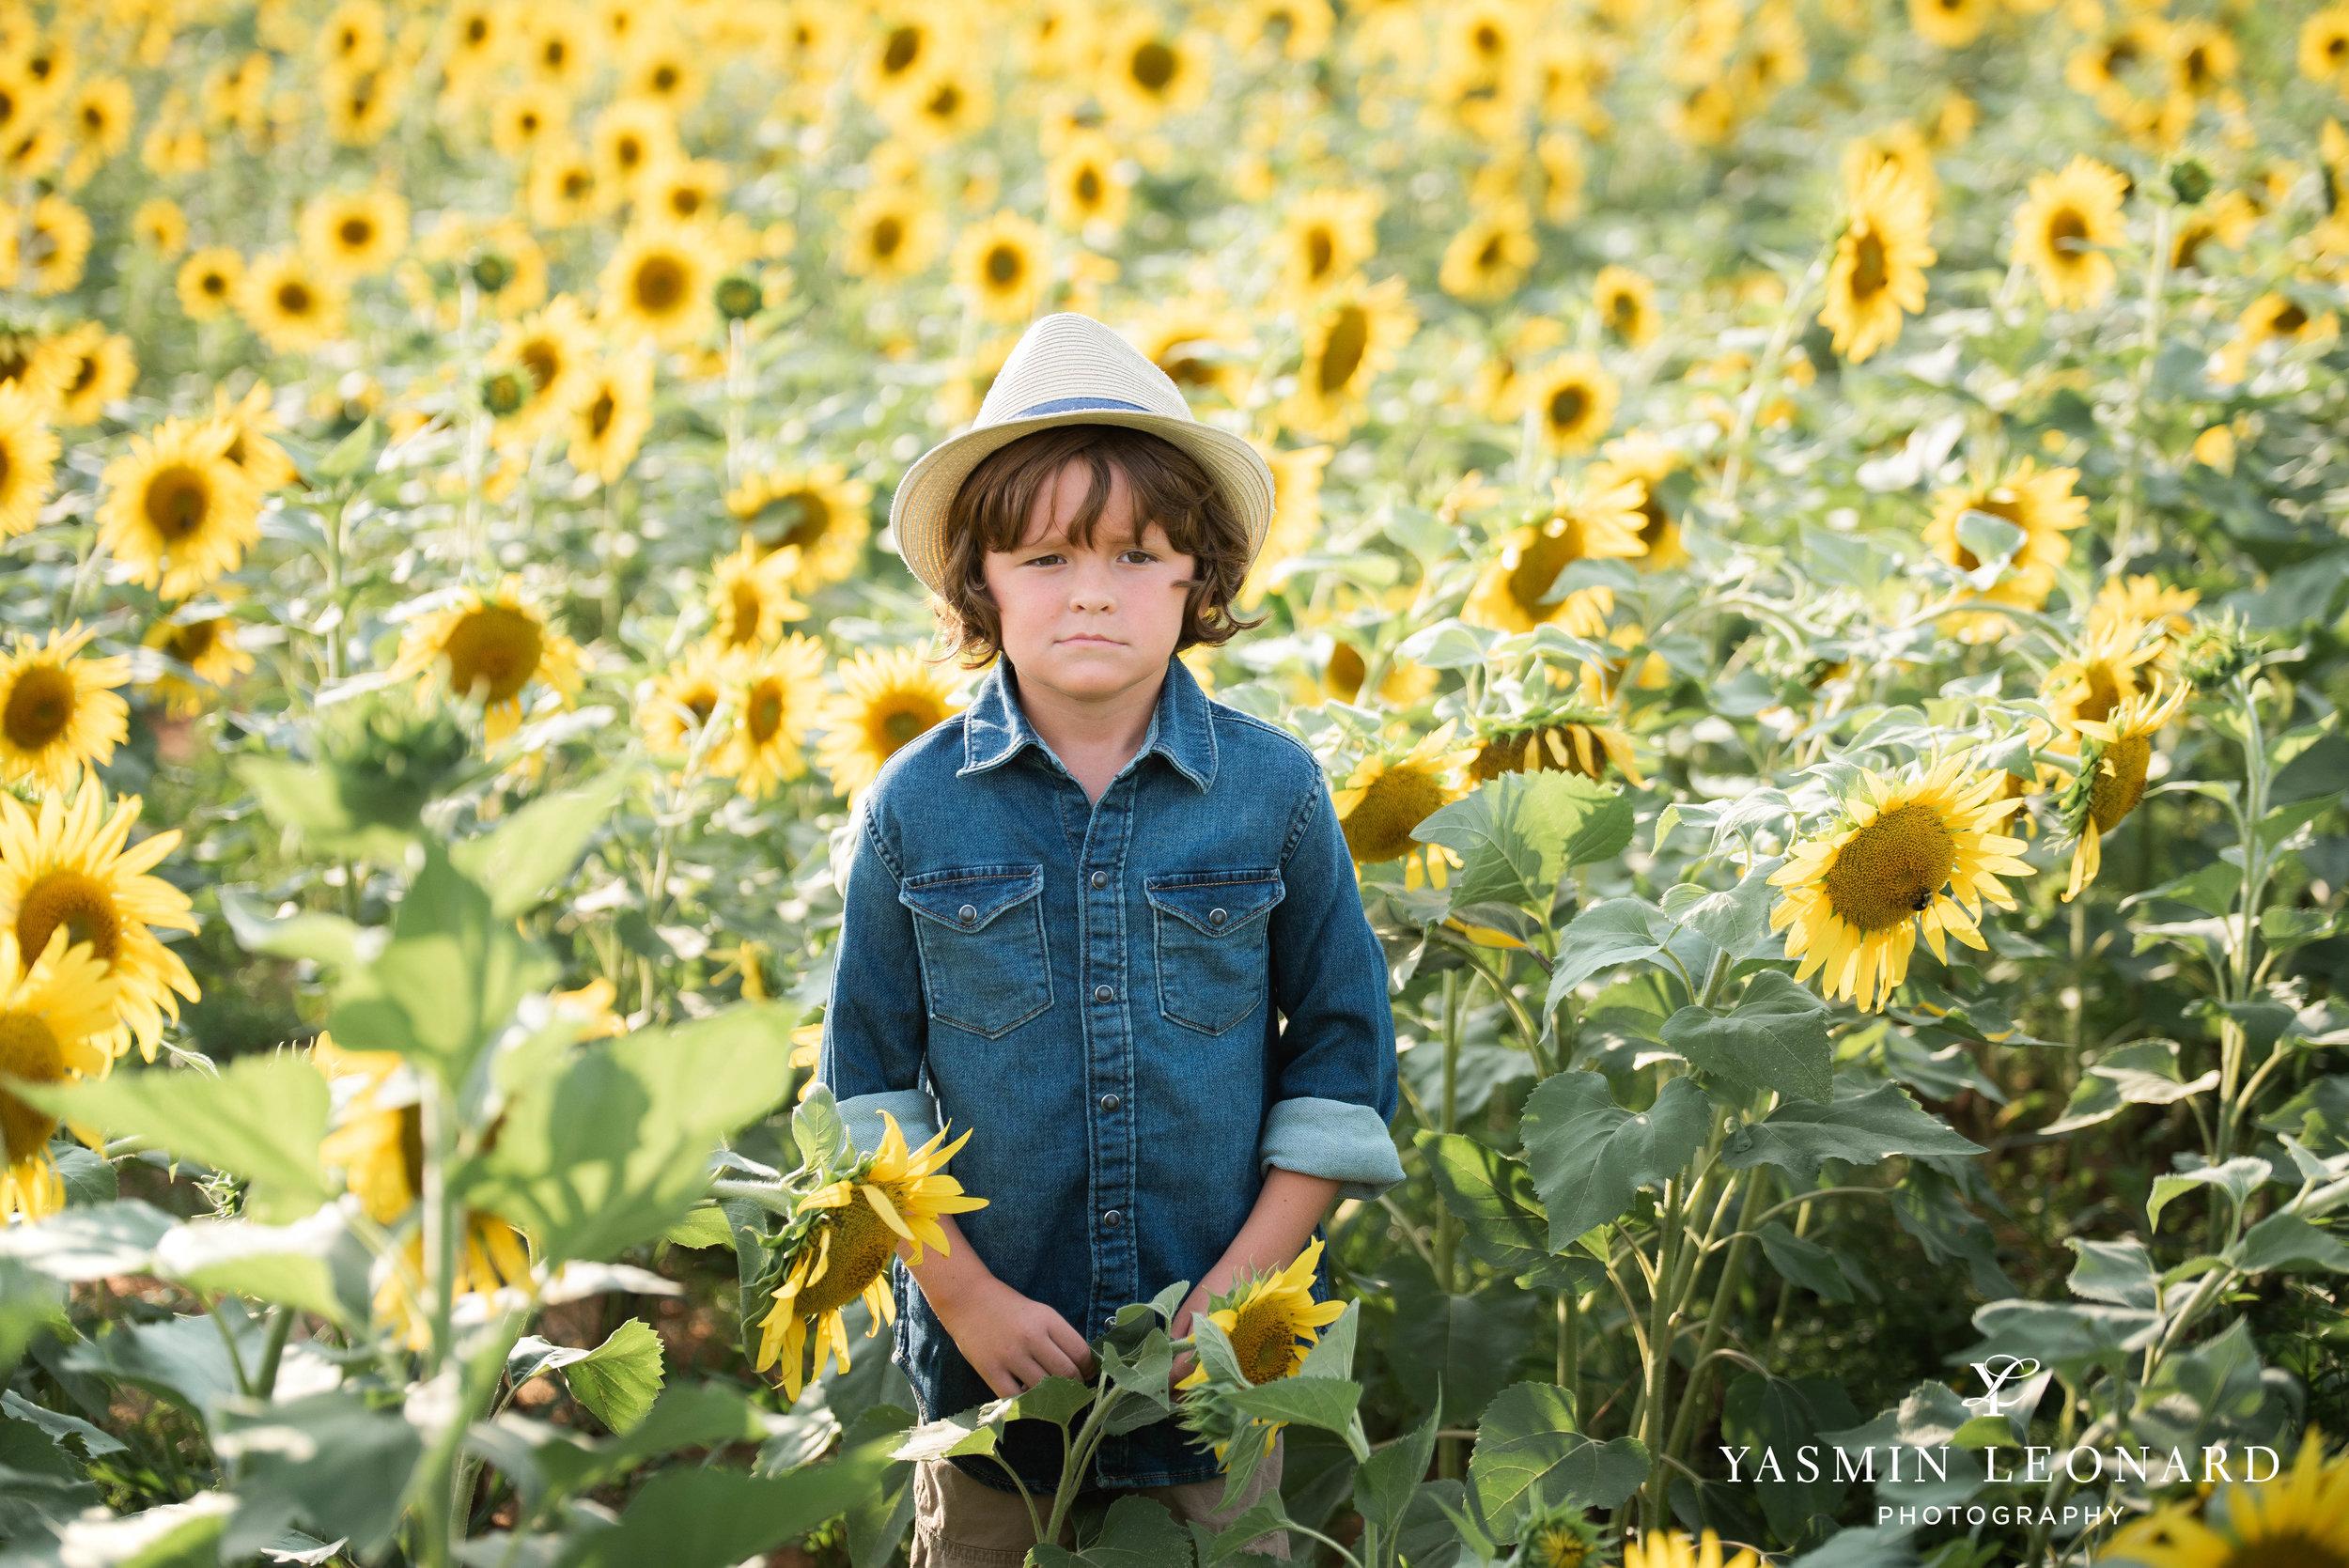 Sunflower Mini Session - Dogwood Farms - Sunflower Field - Boys in Sunflower Field - What to wear sunflower field - Yasmin Leonard Photography-3.jpg